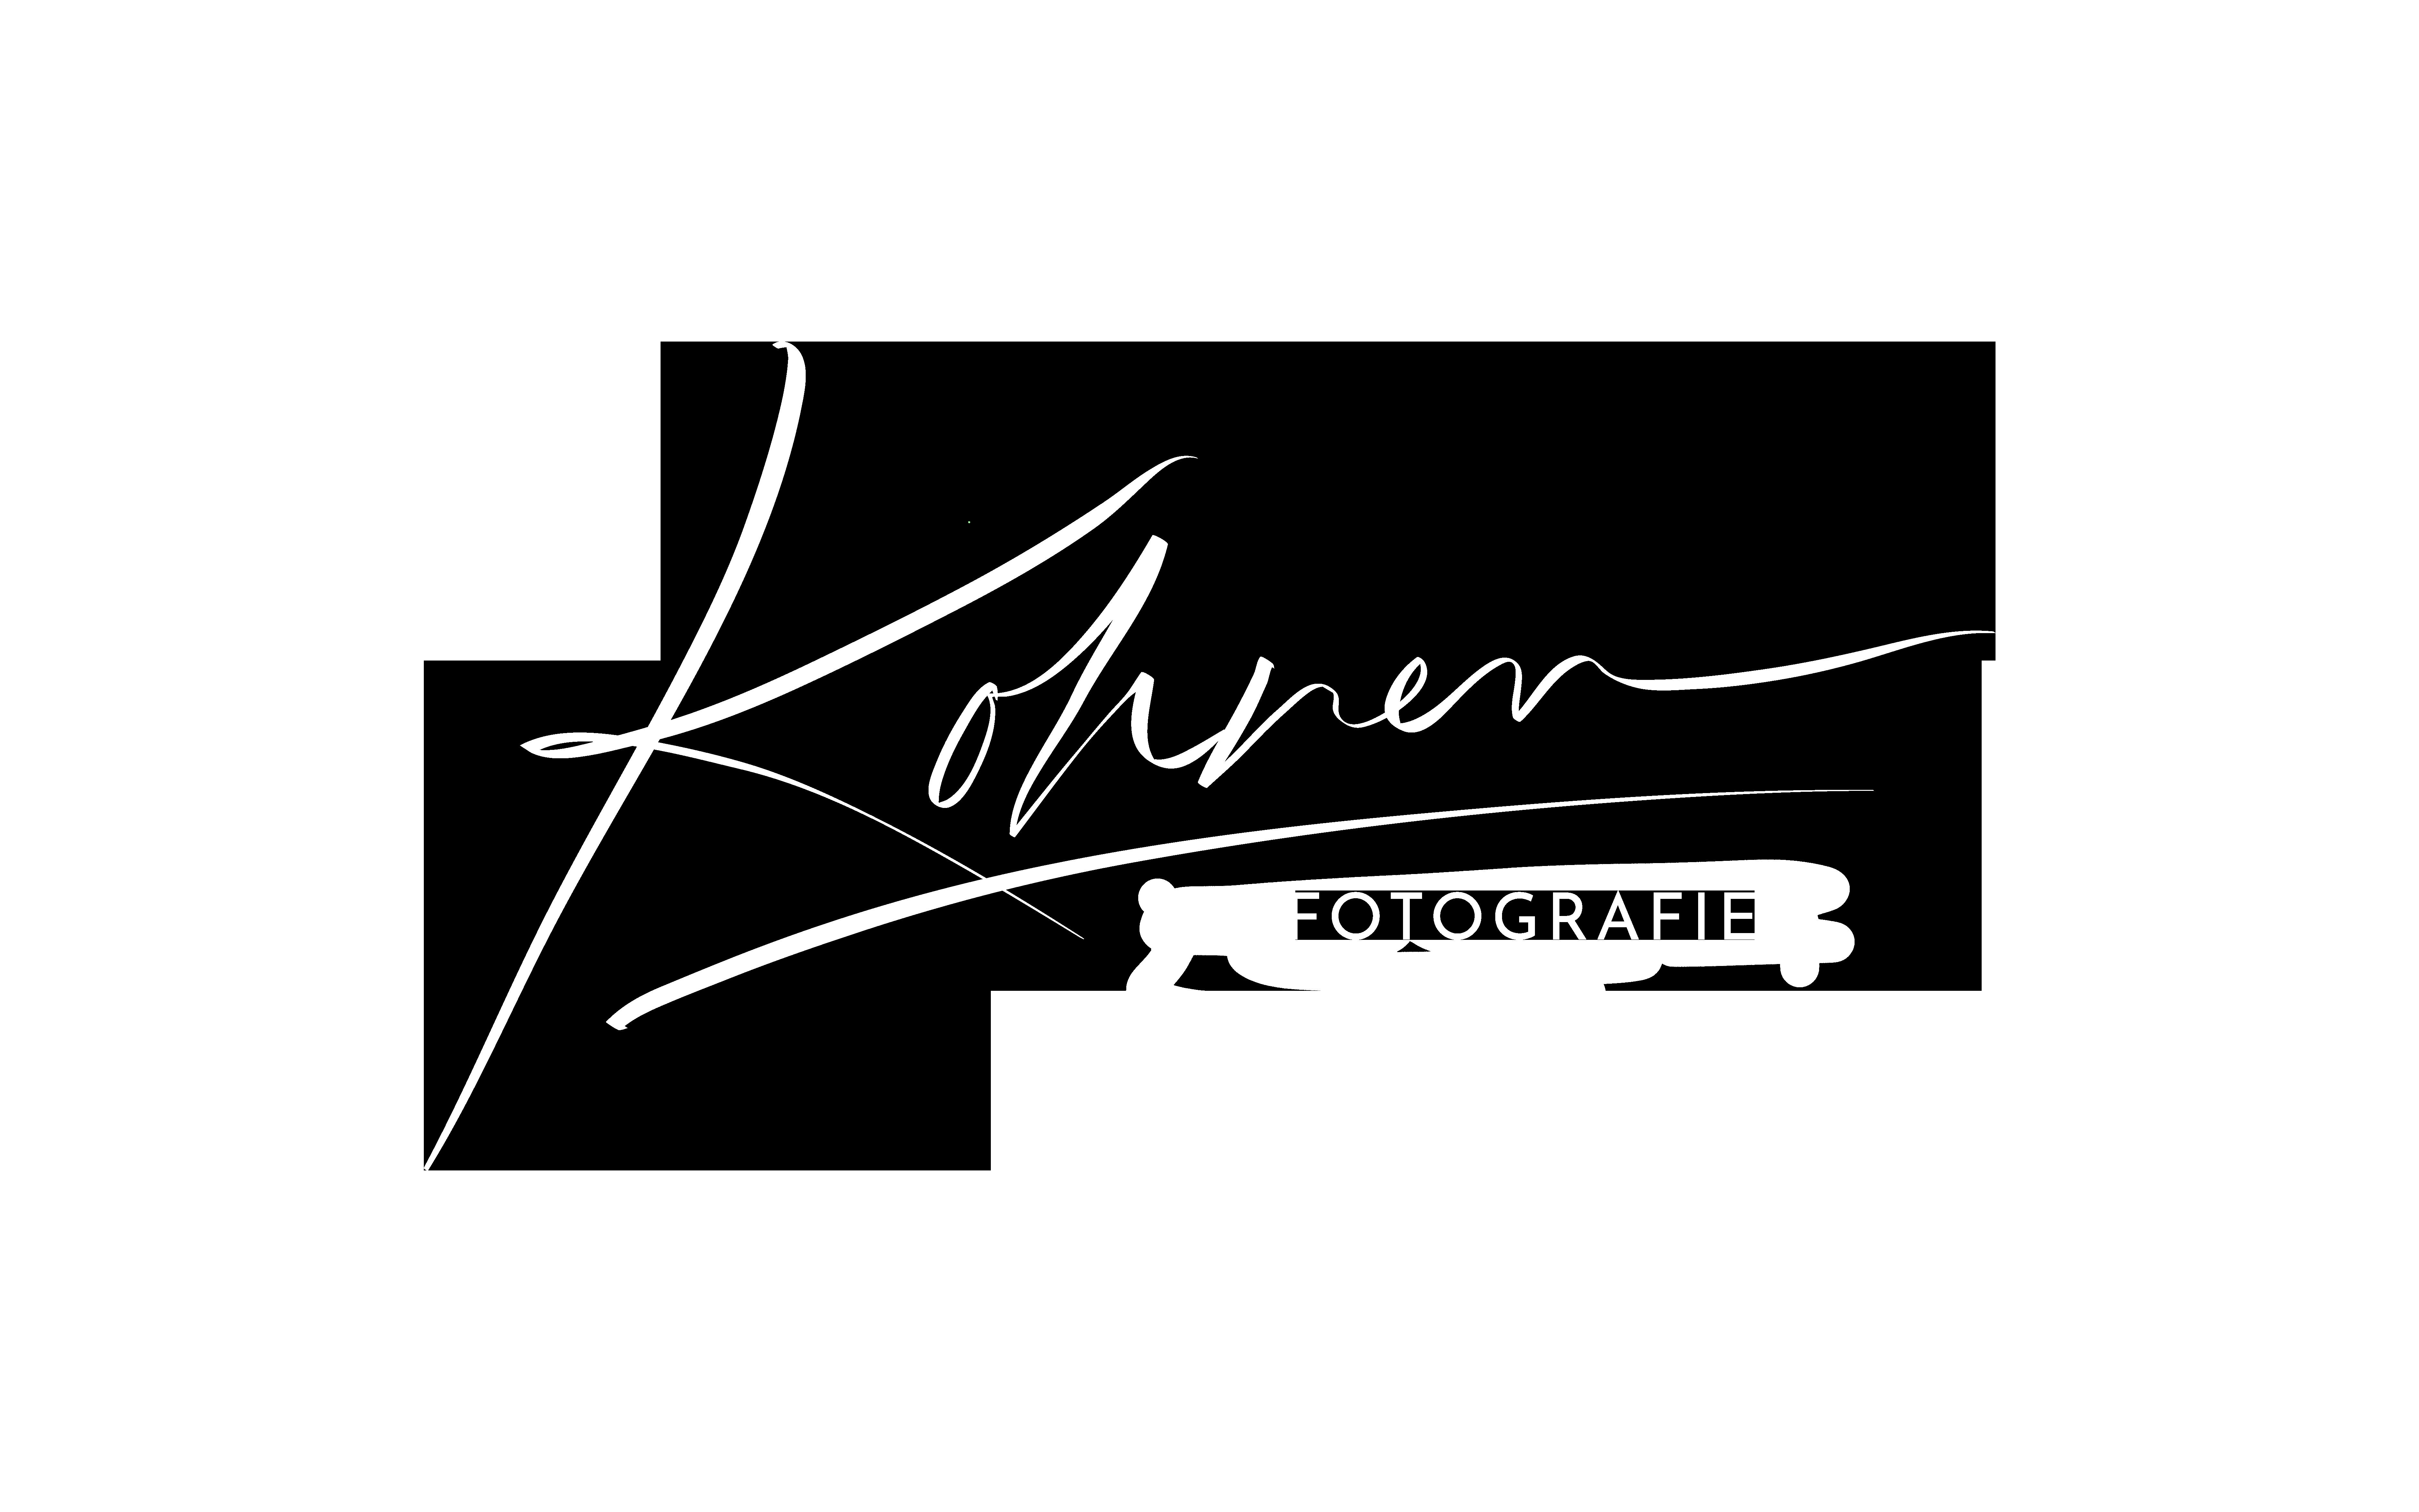 Kohnen Fotografie